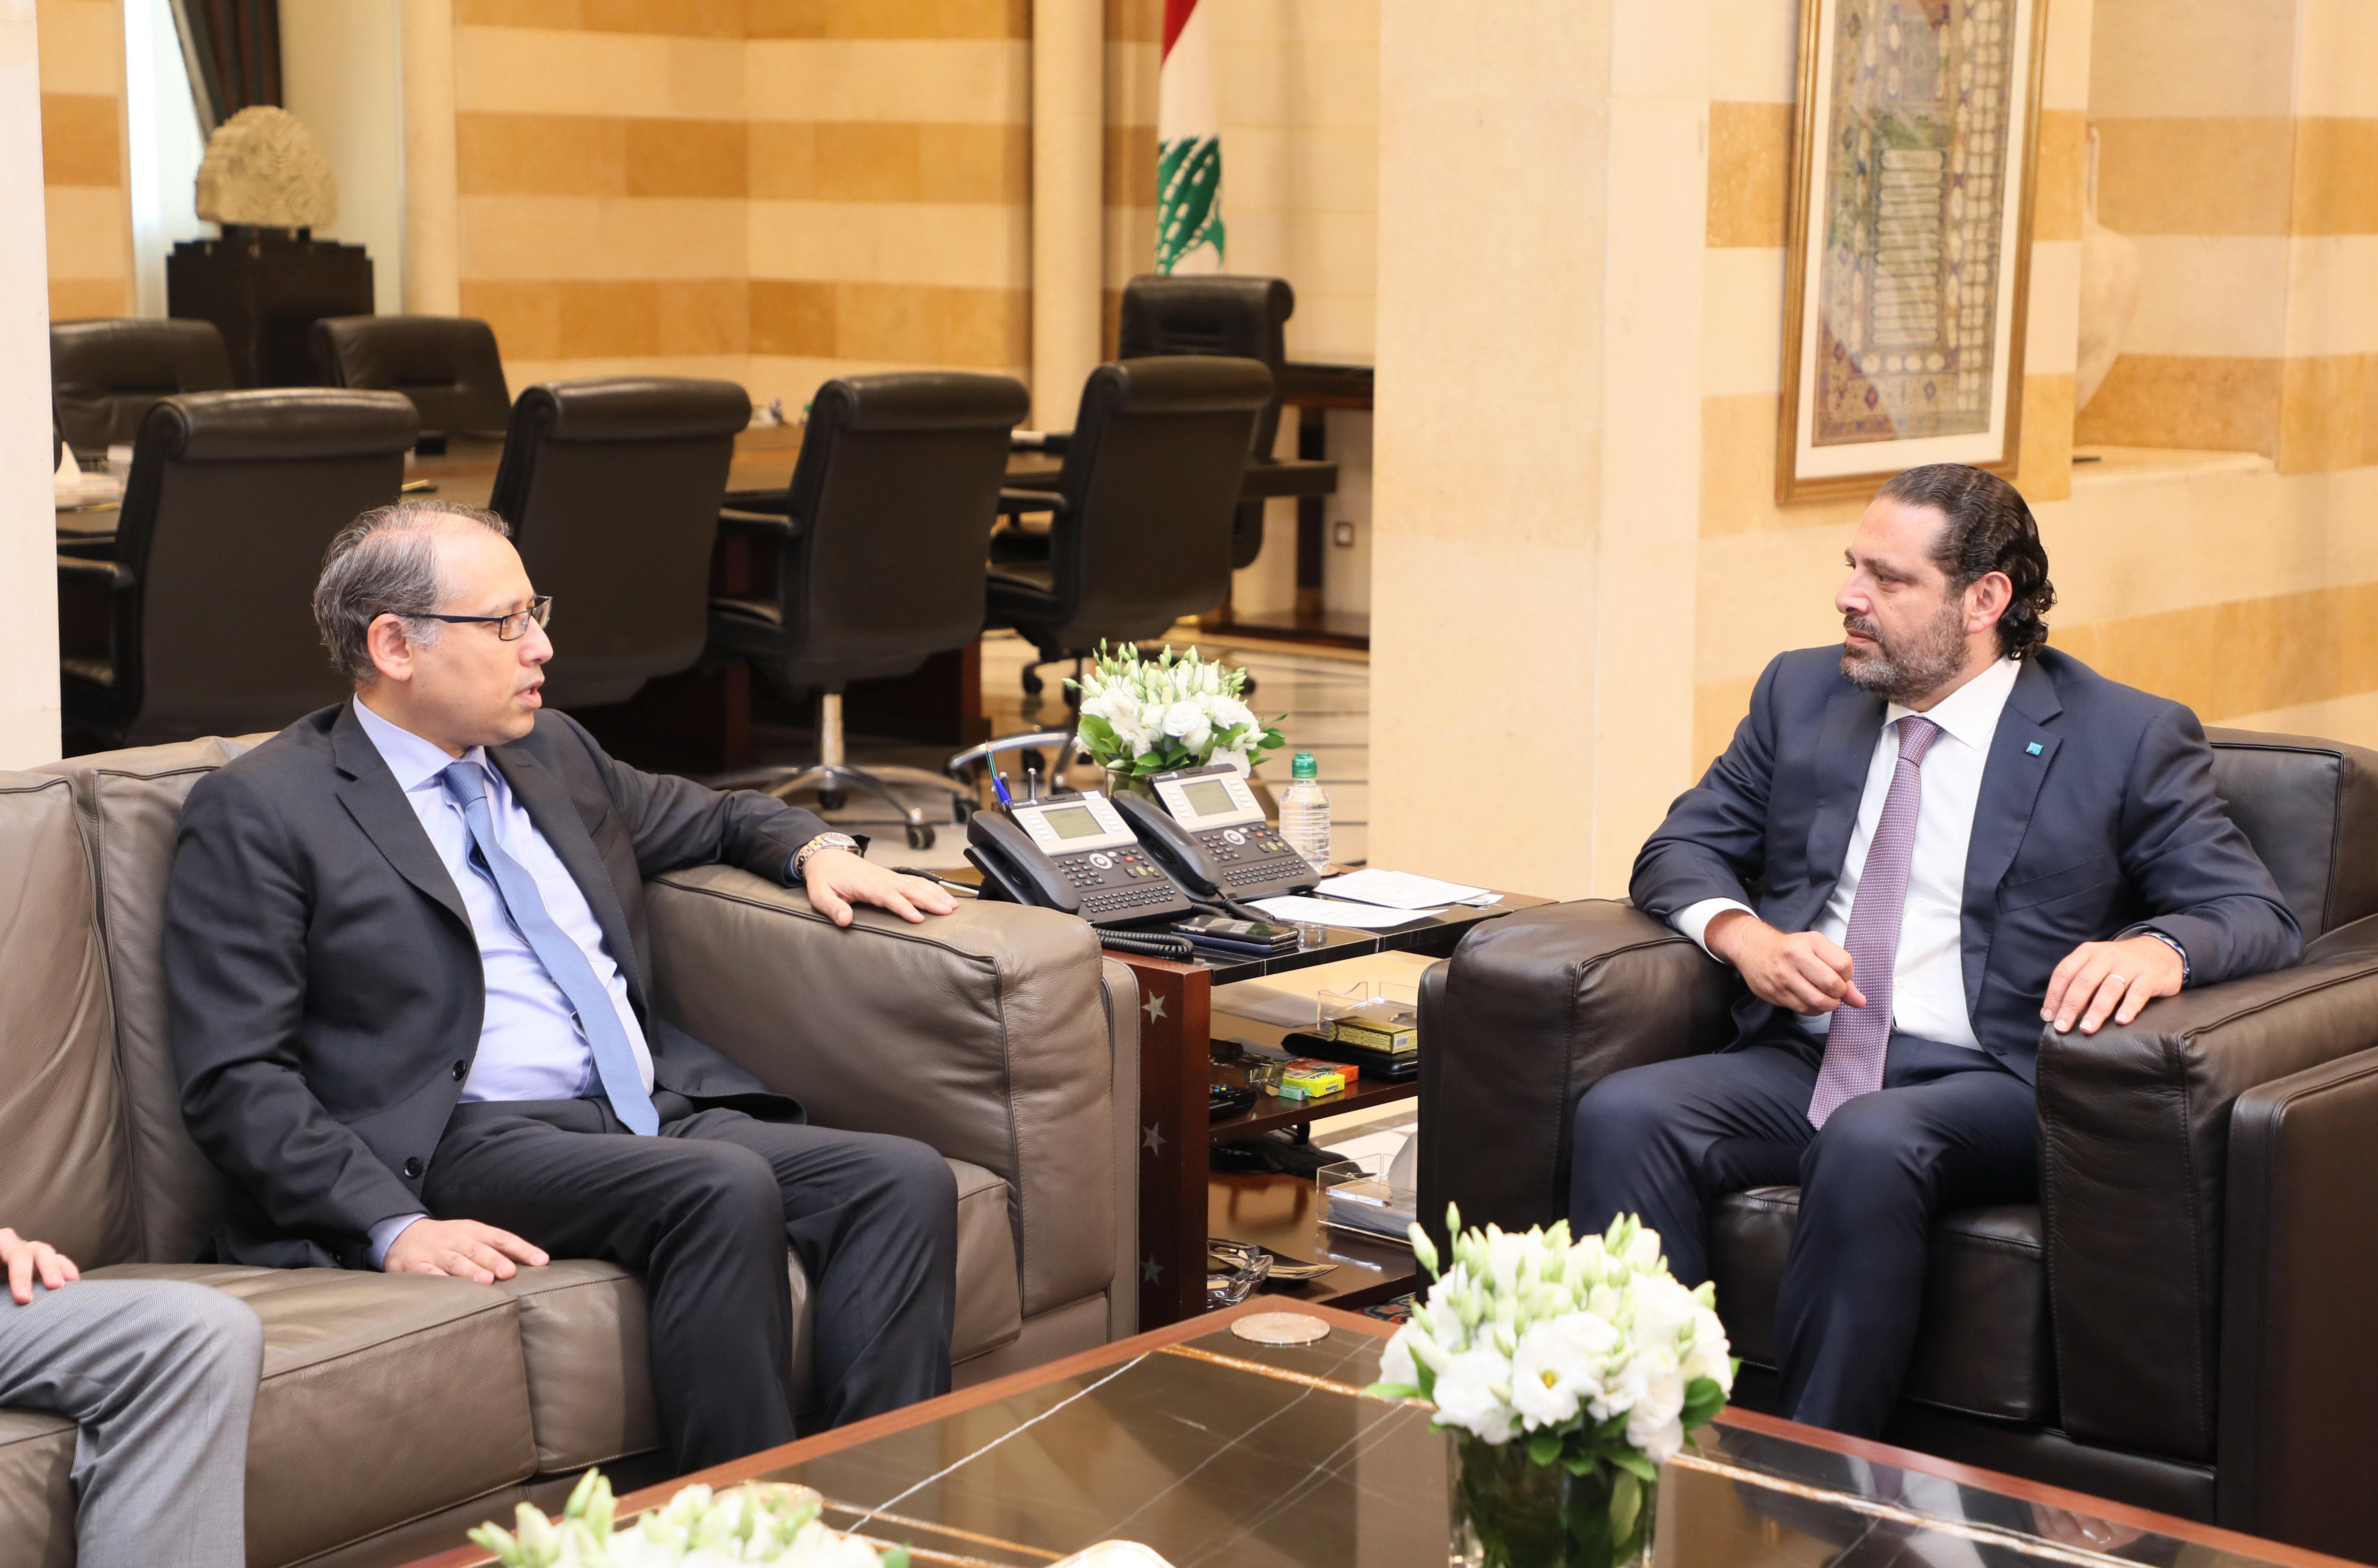 Pr Minister Saad Hariri meets Egeptian Ambassador